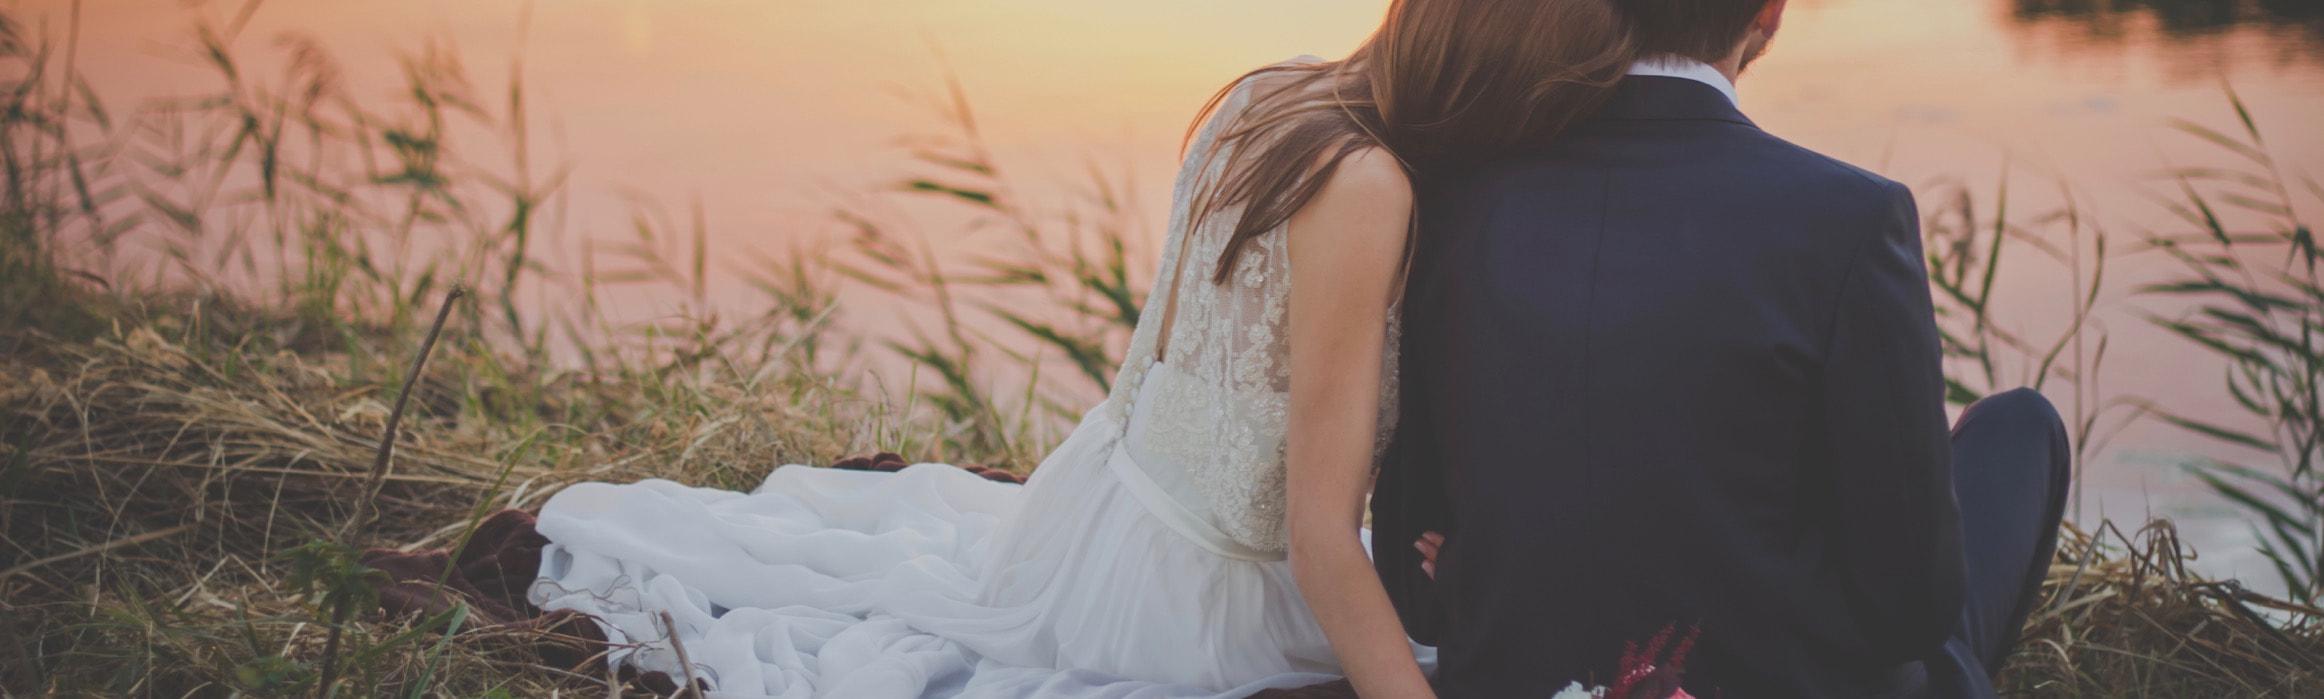 Ideen Tipps Hochzeitsfotos